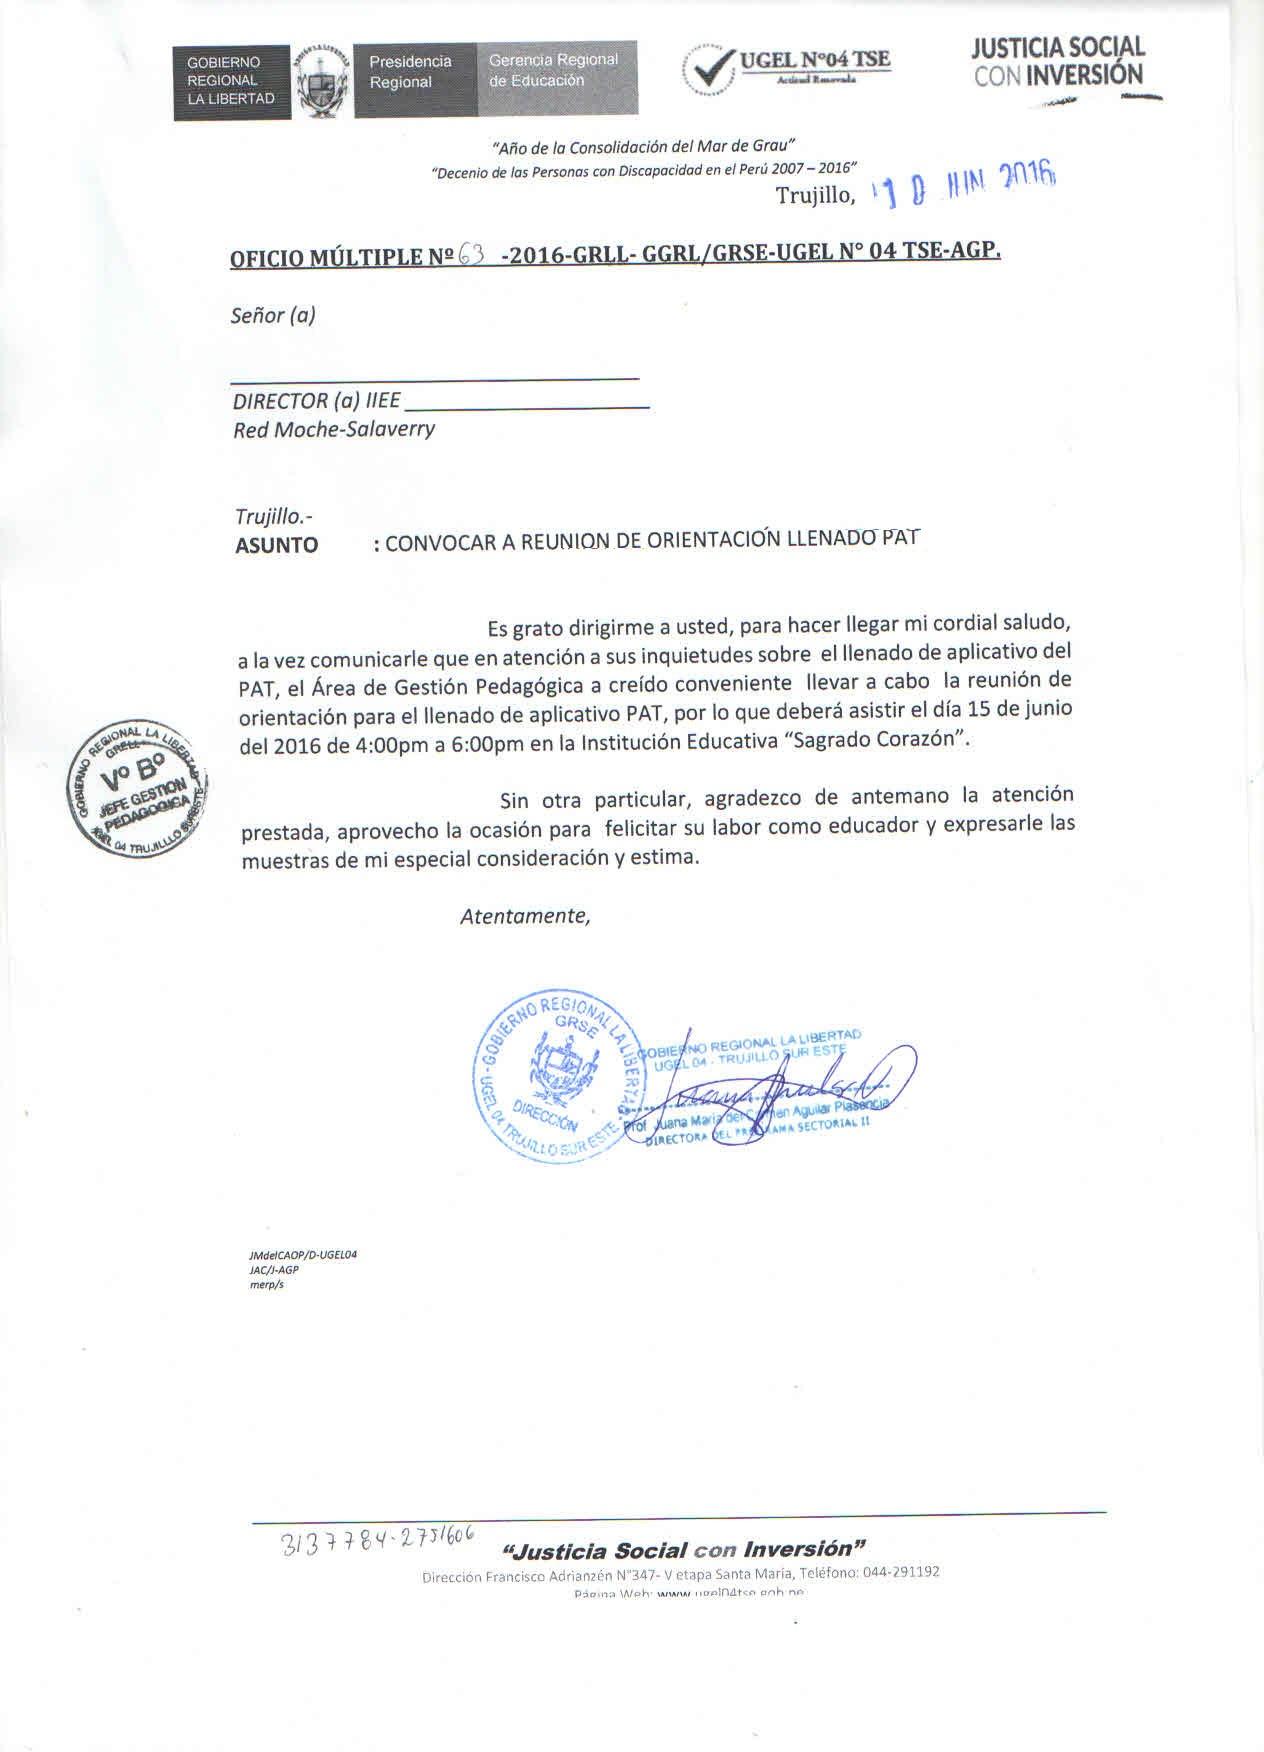 Oficio m ltiple n 63 2016 agp red moche salaverry for Convocatoria para docentes 2016